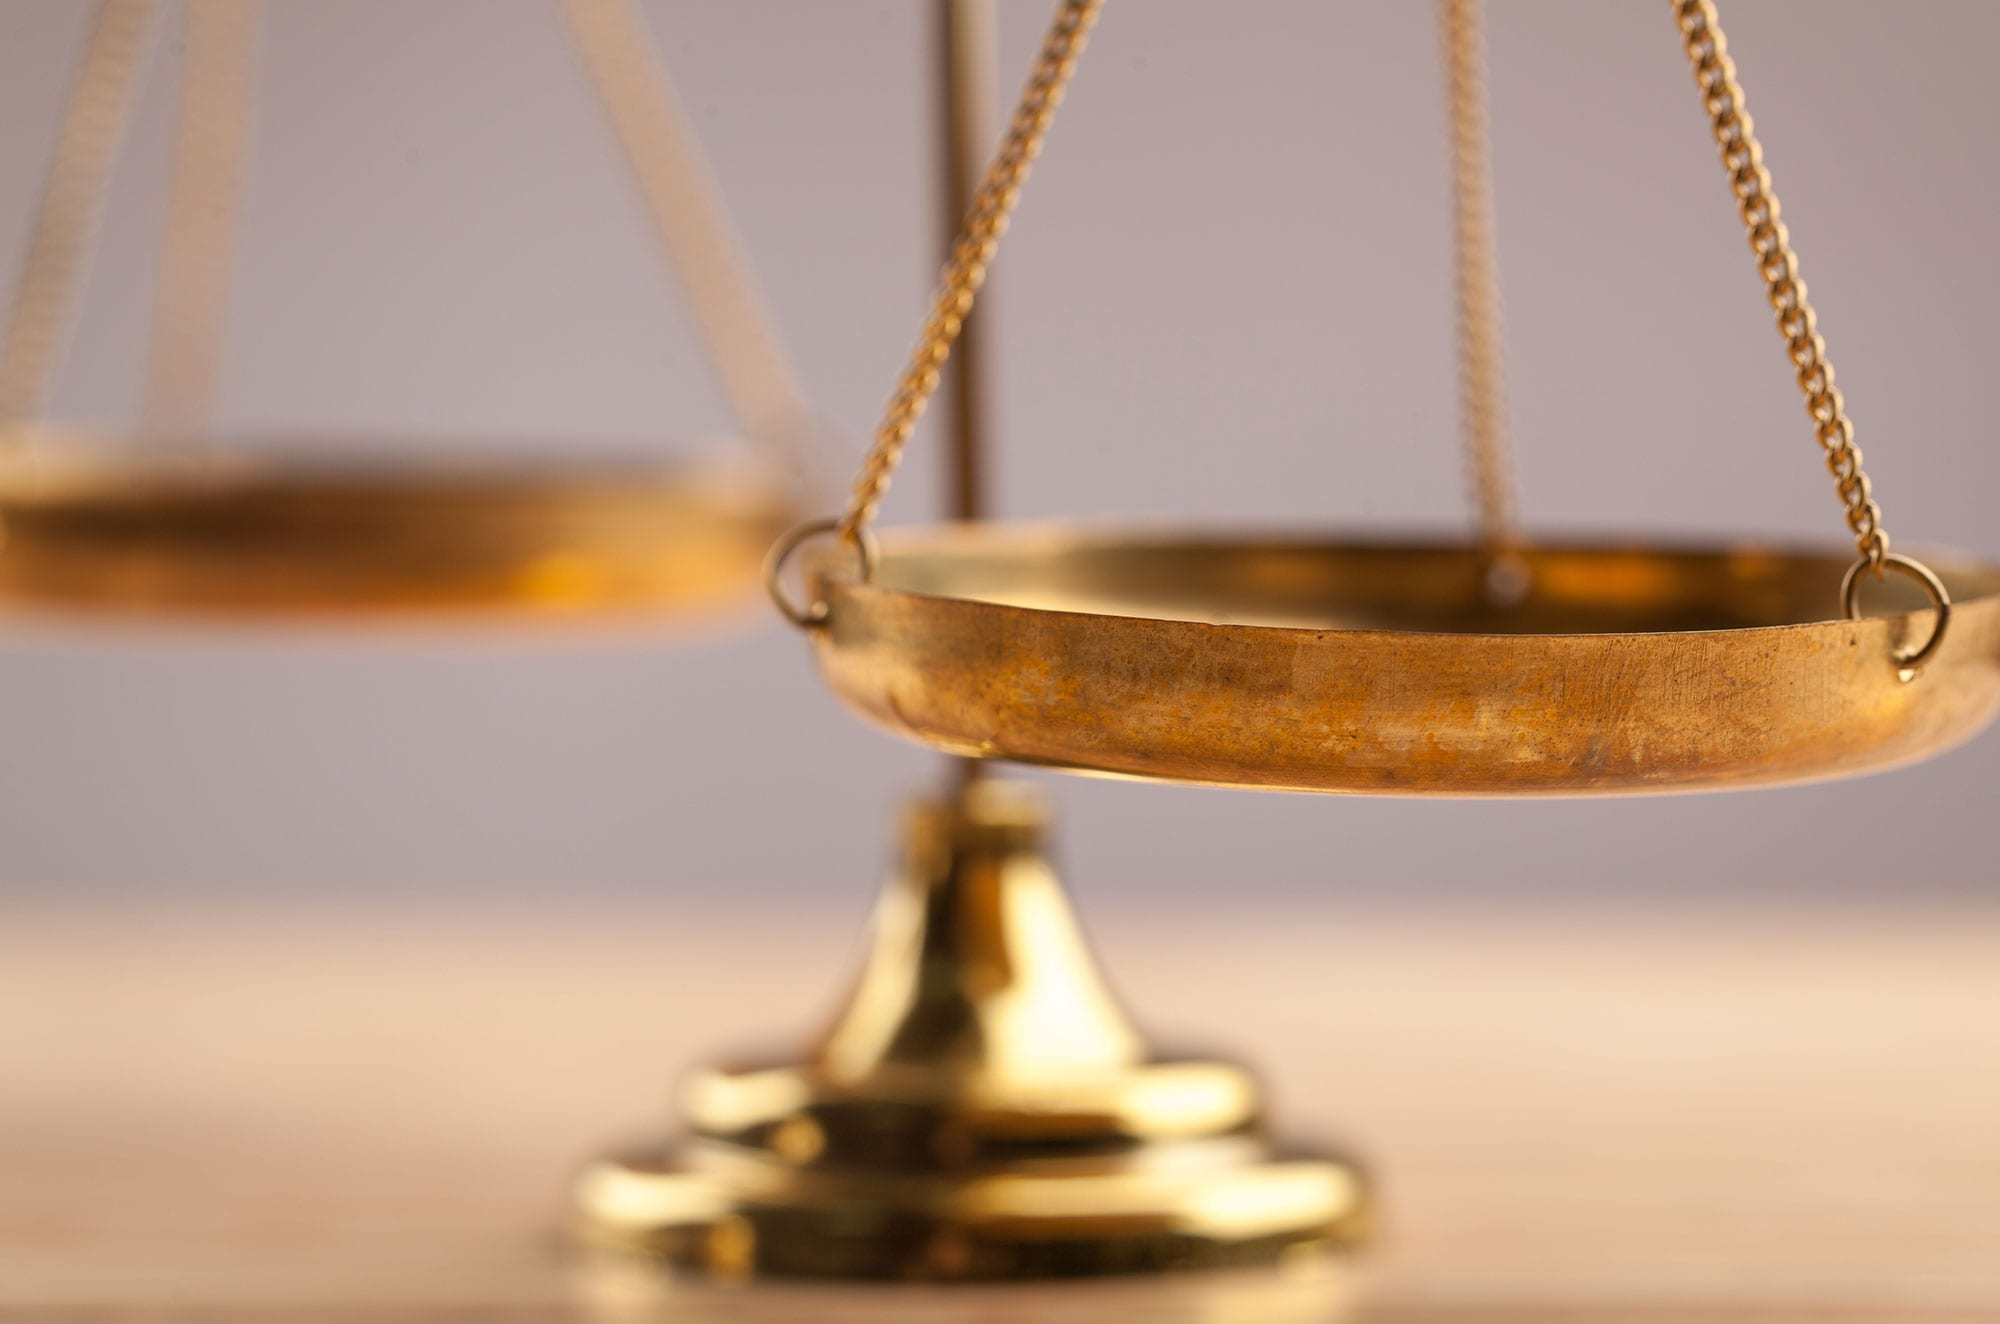 Rebalancing: What and Why